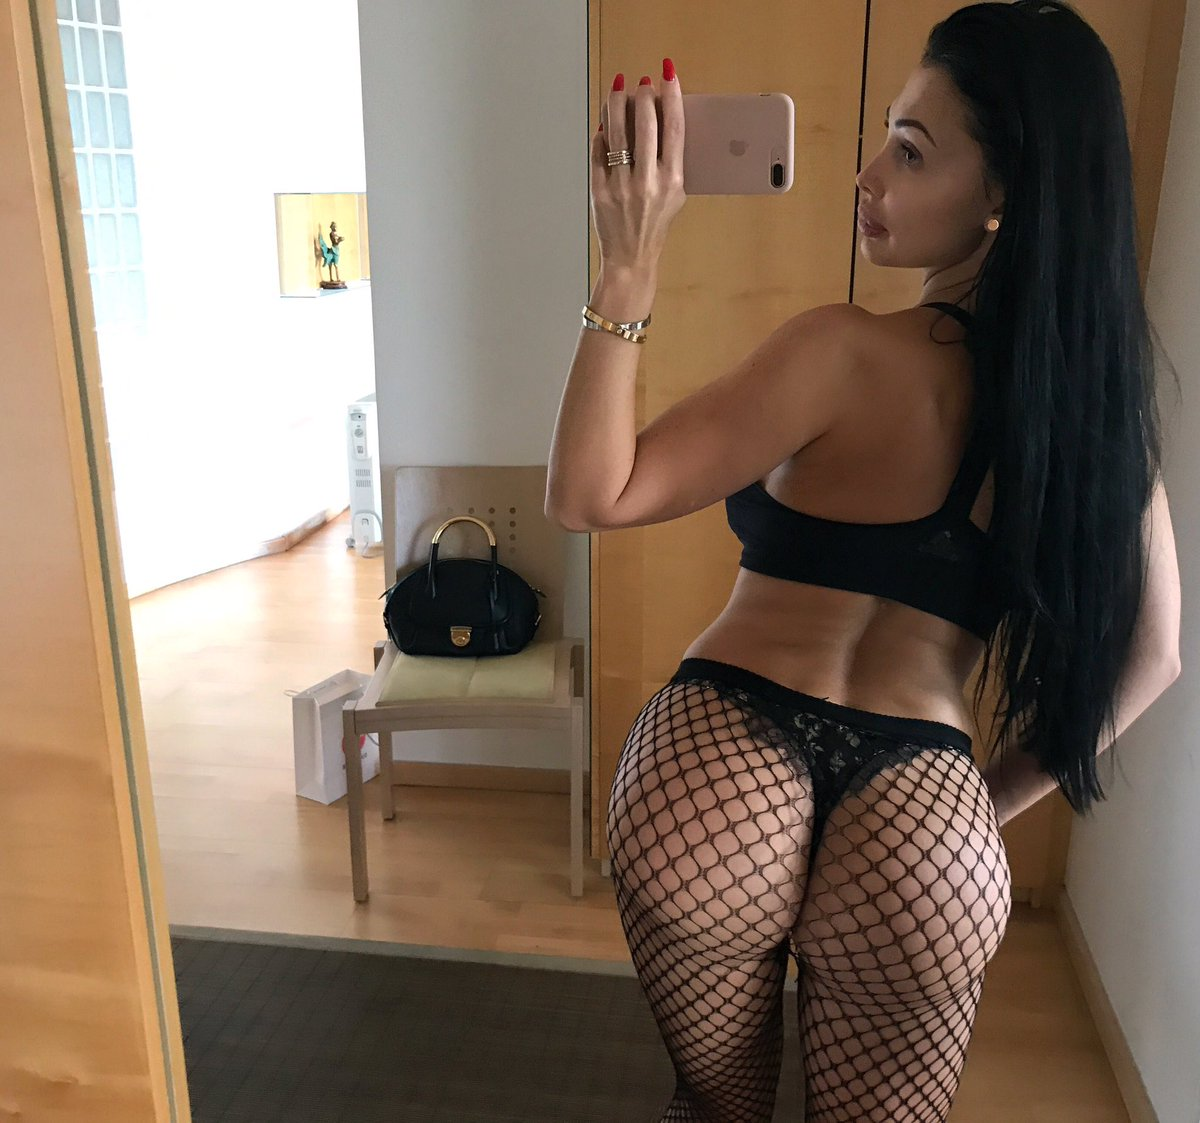 Aletta Ocean-pornstar  - 💋 twitter @ALETTAOCEANXXXX